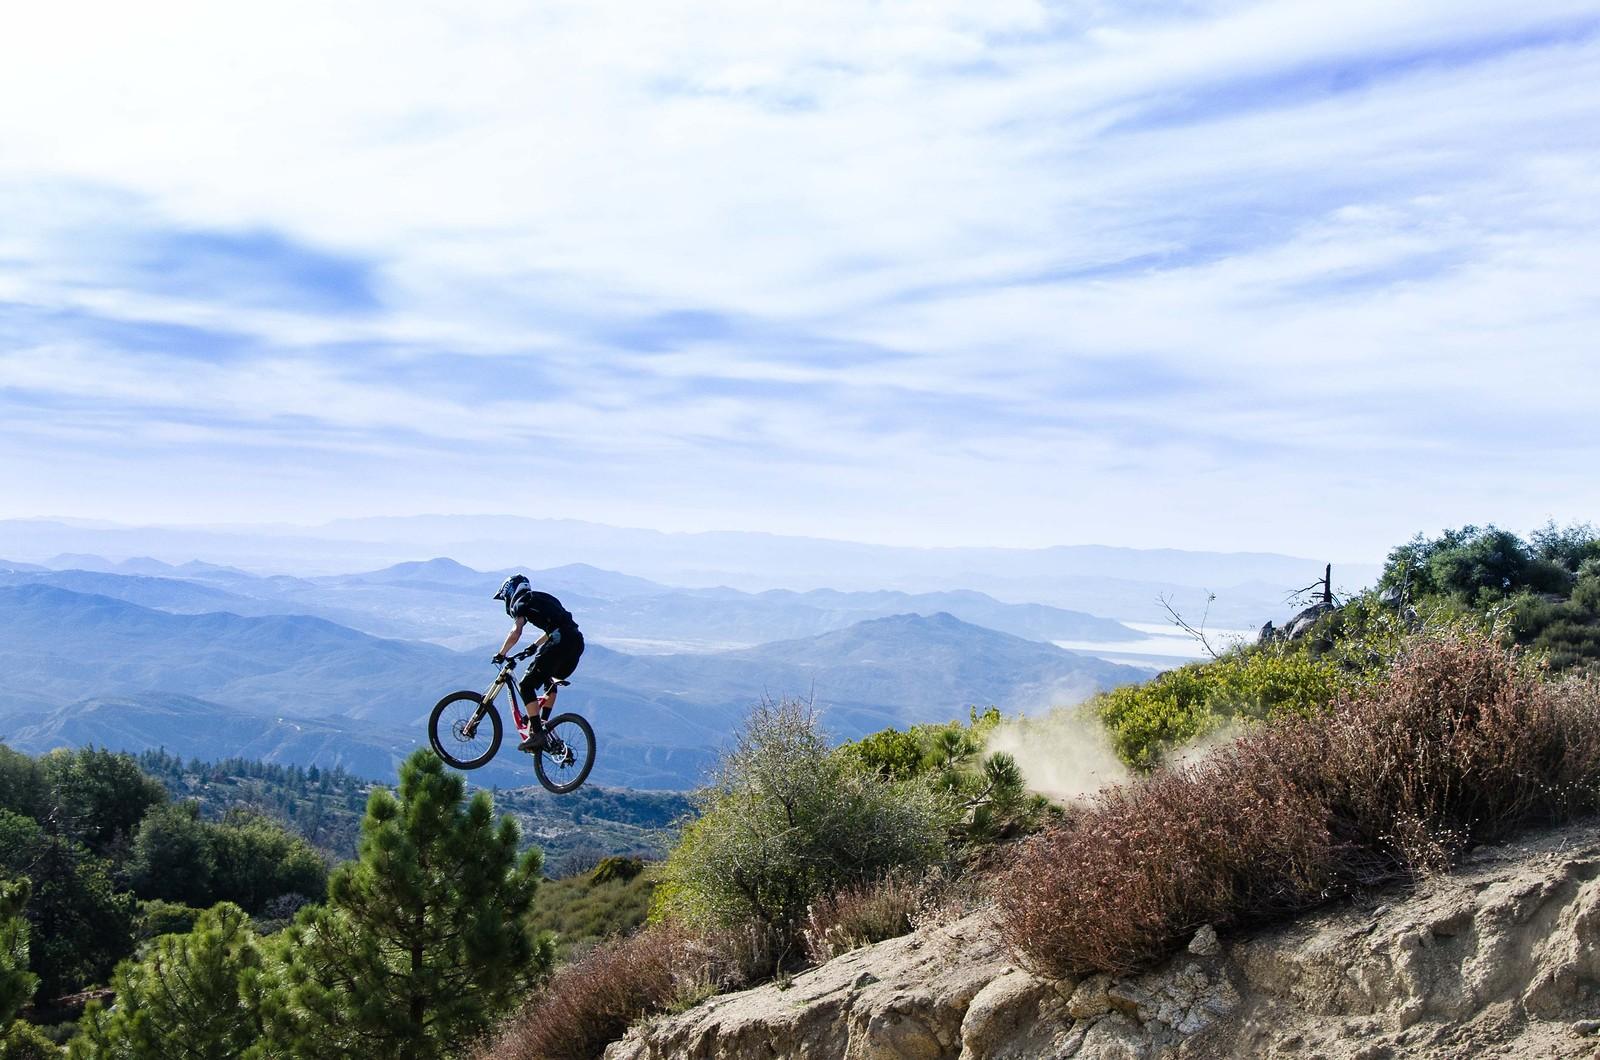 Road Gaps to Where? - dhjunke - Mountain Biking Pictures - Vital MTB